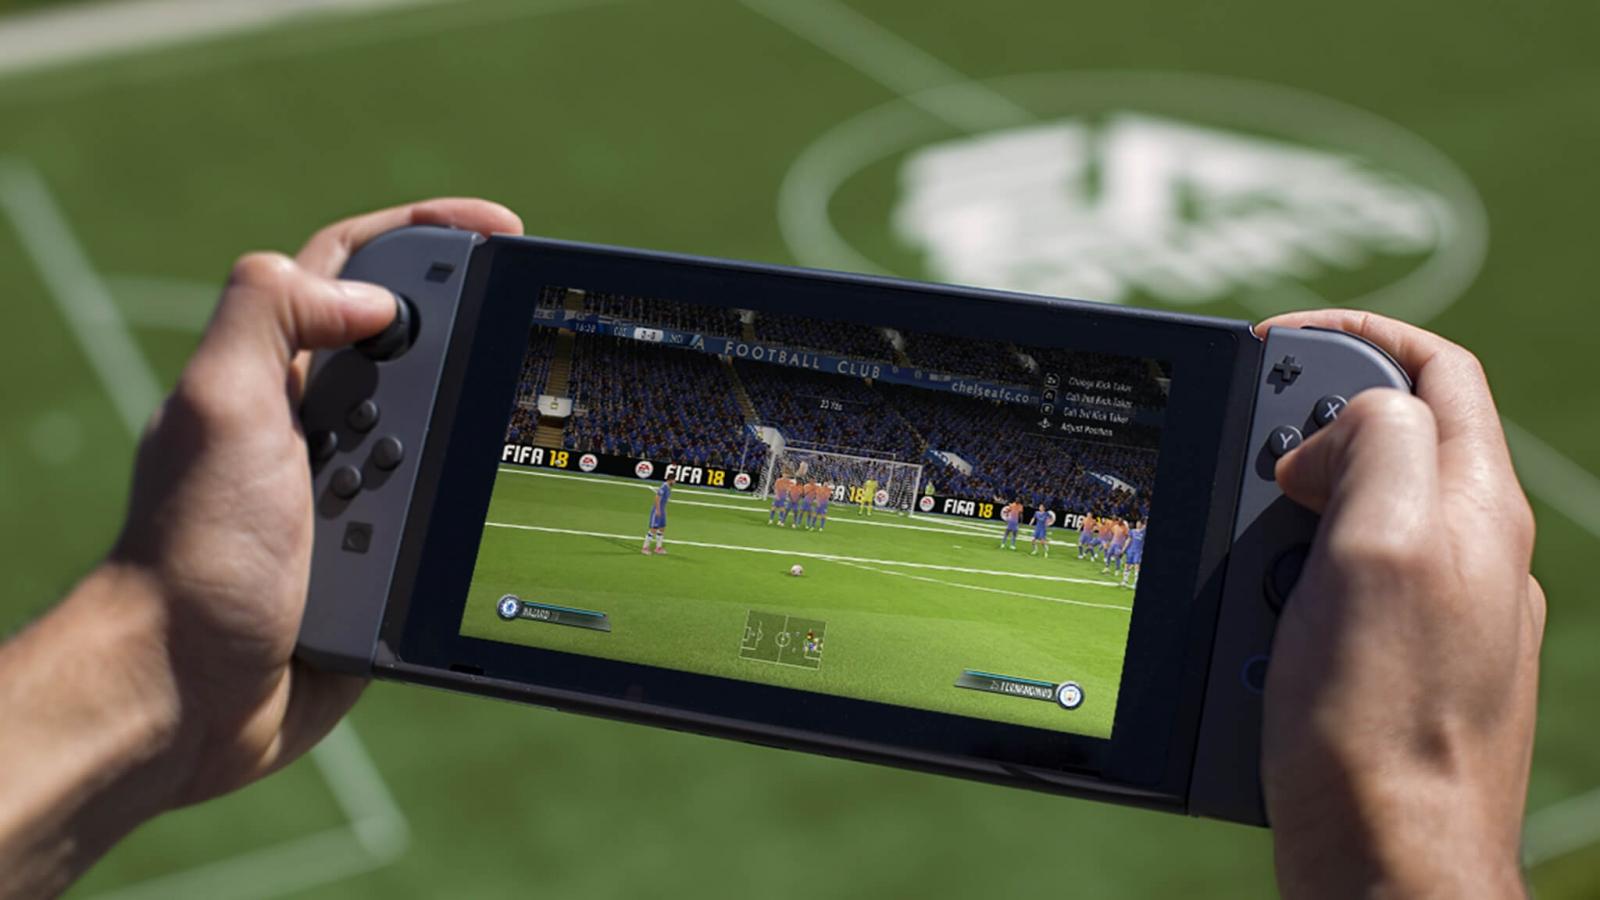 Watch FIFA 18's The Journey: Hunter Returns teaser trailer